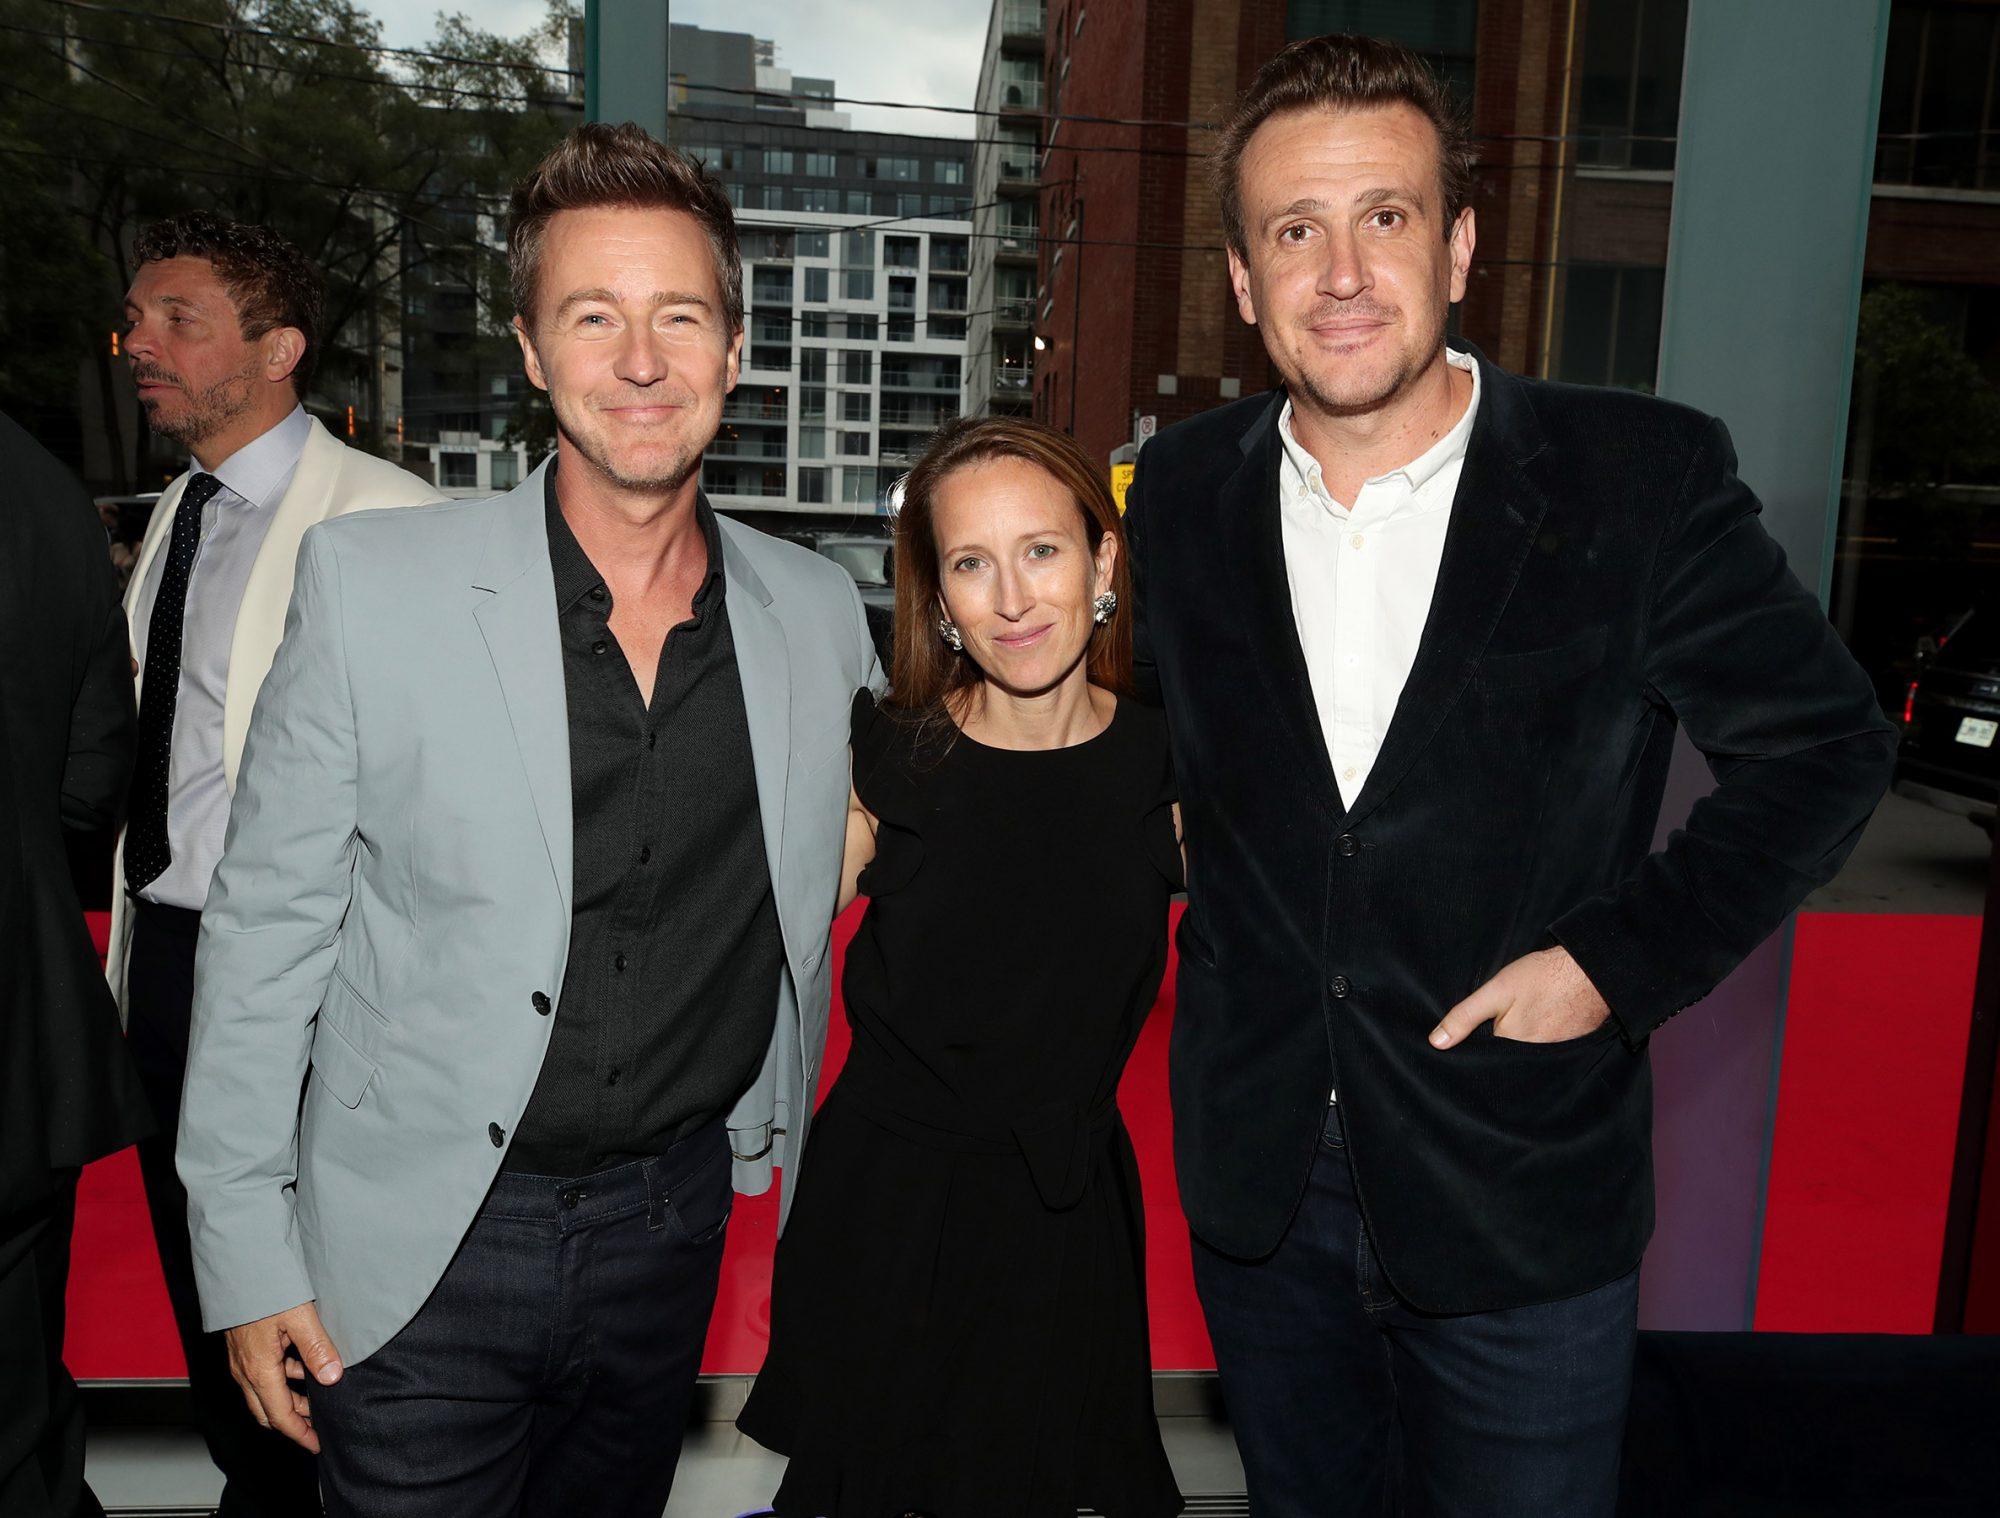 Edward Norton, Shauna Robertson and Jason Segel